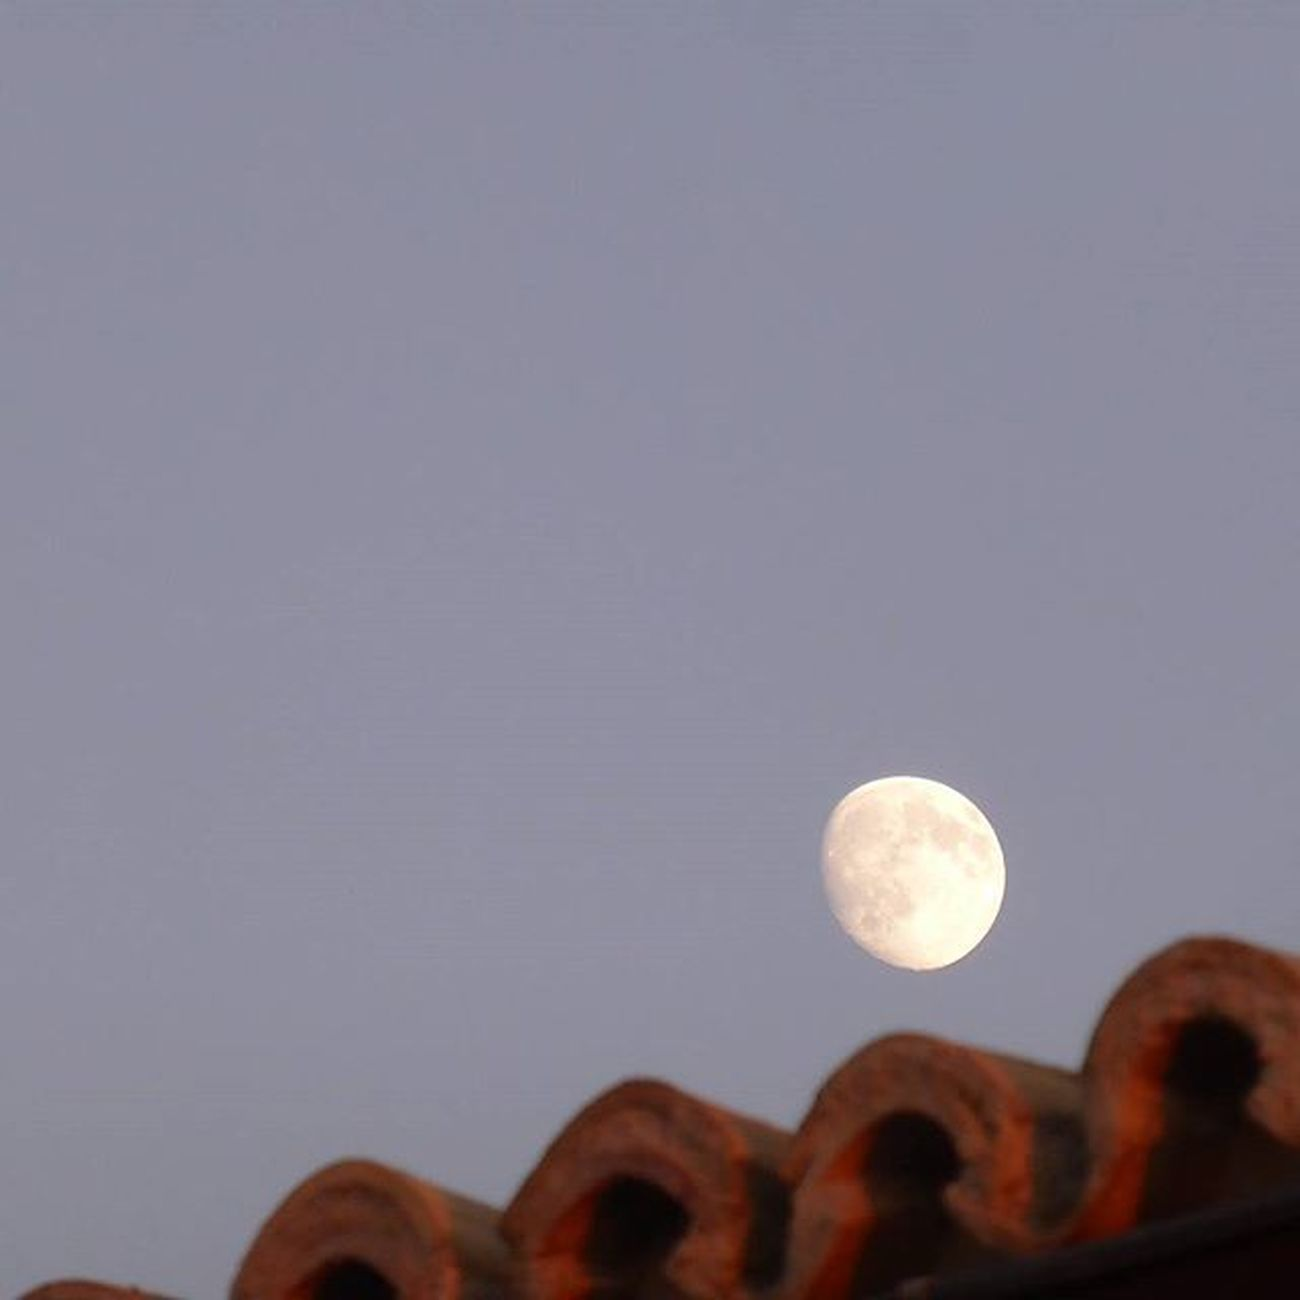 Asomando. Lunalunera Skylovers LasPedrosas Moon igerszgz instazgz igersaragon sky Luna YovisitoCincoVillas